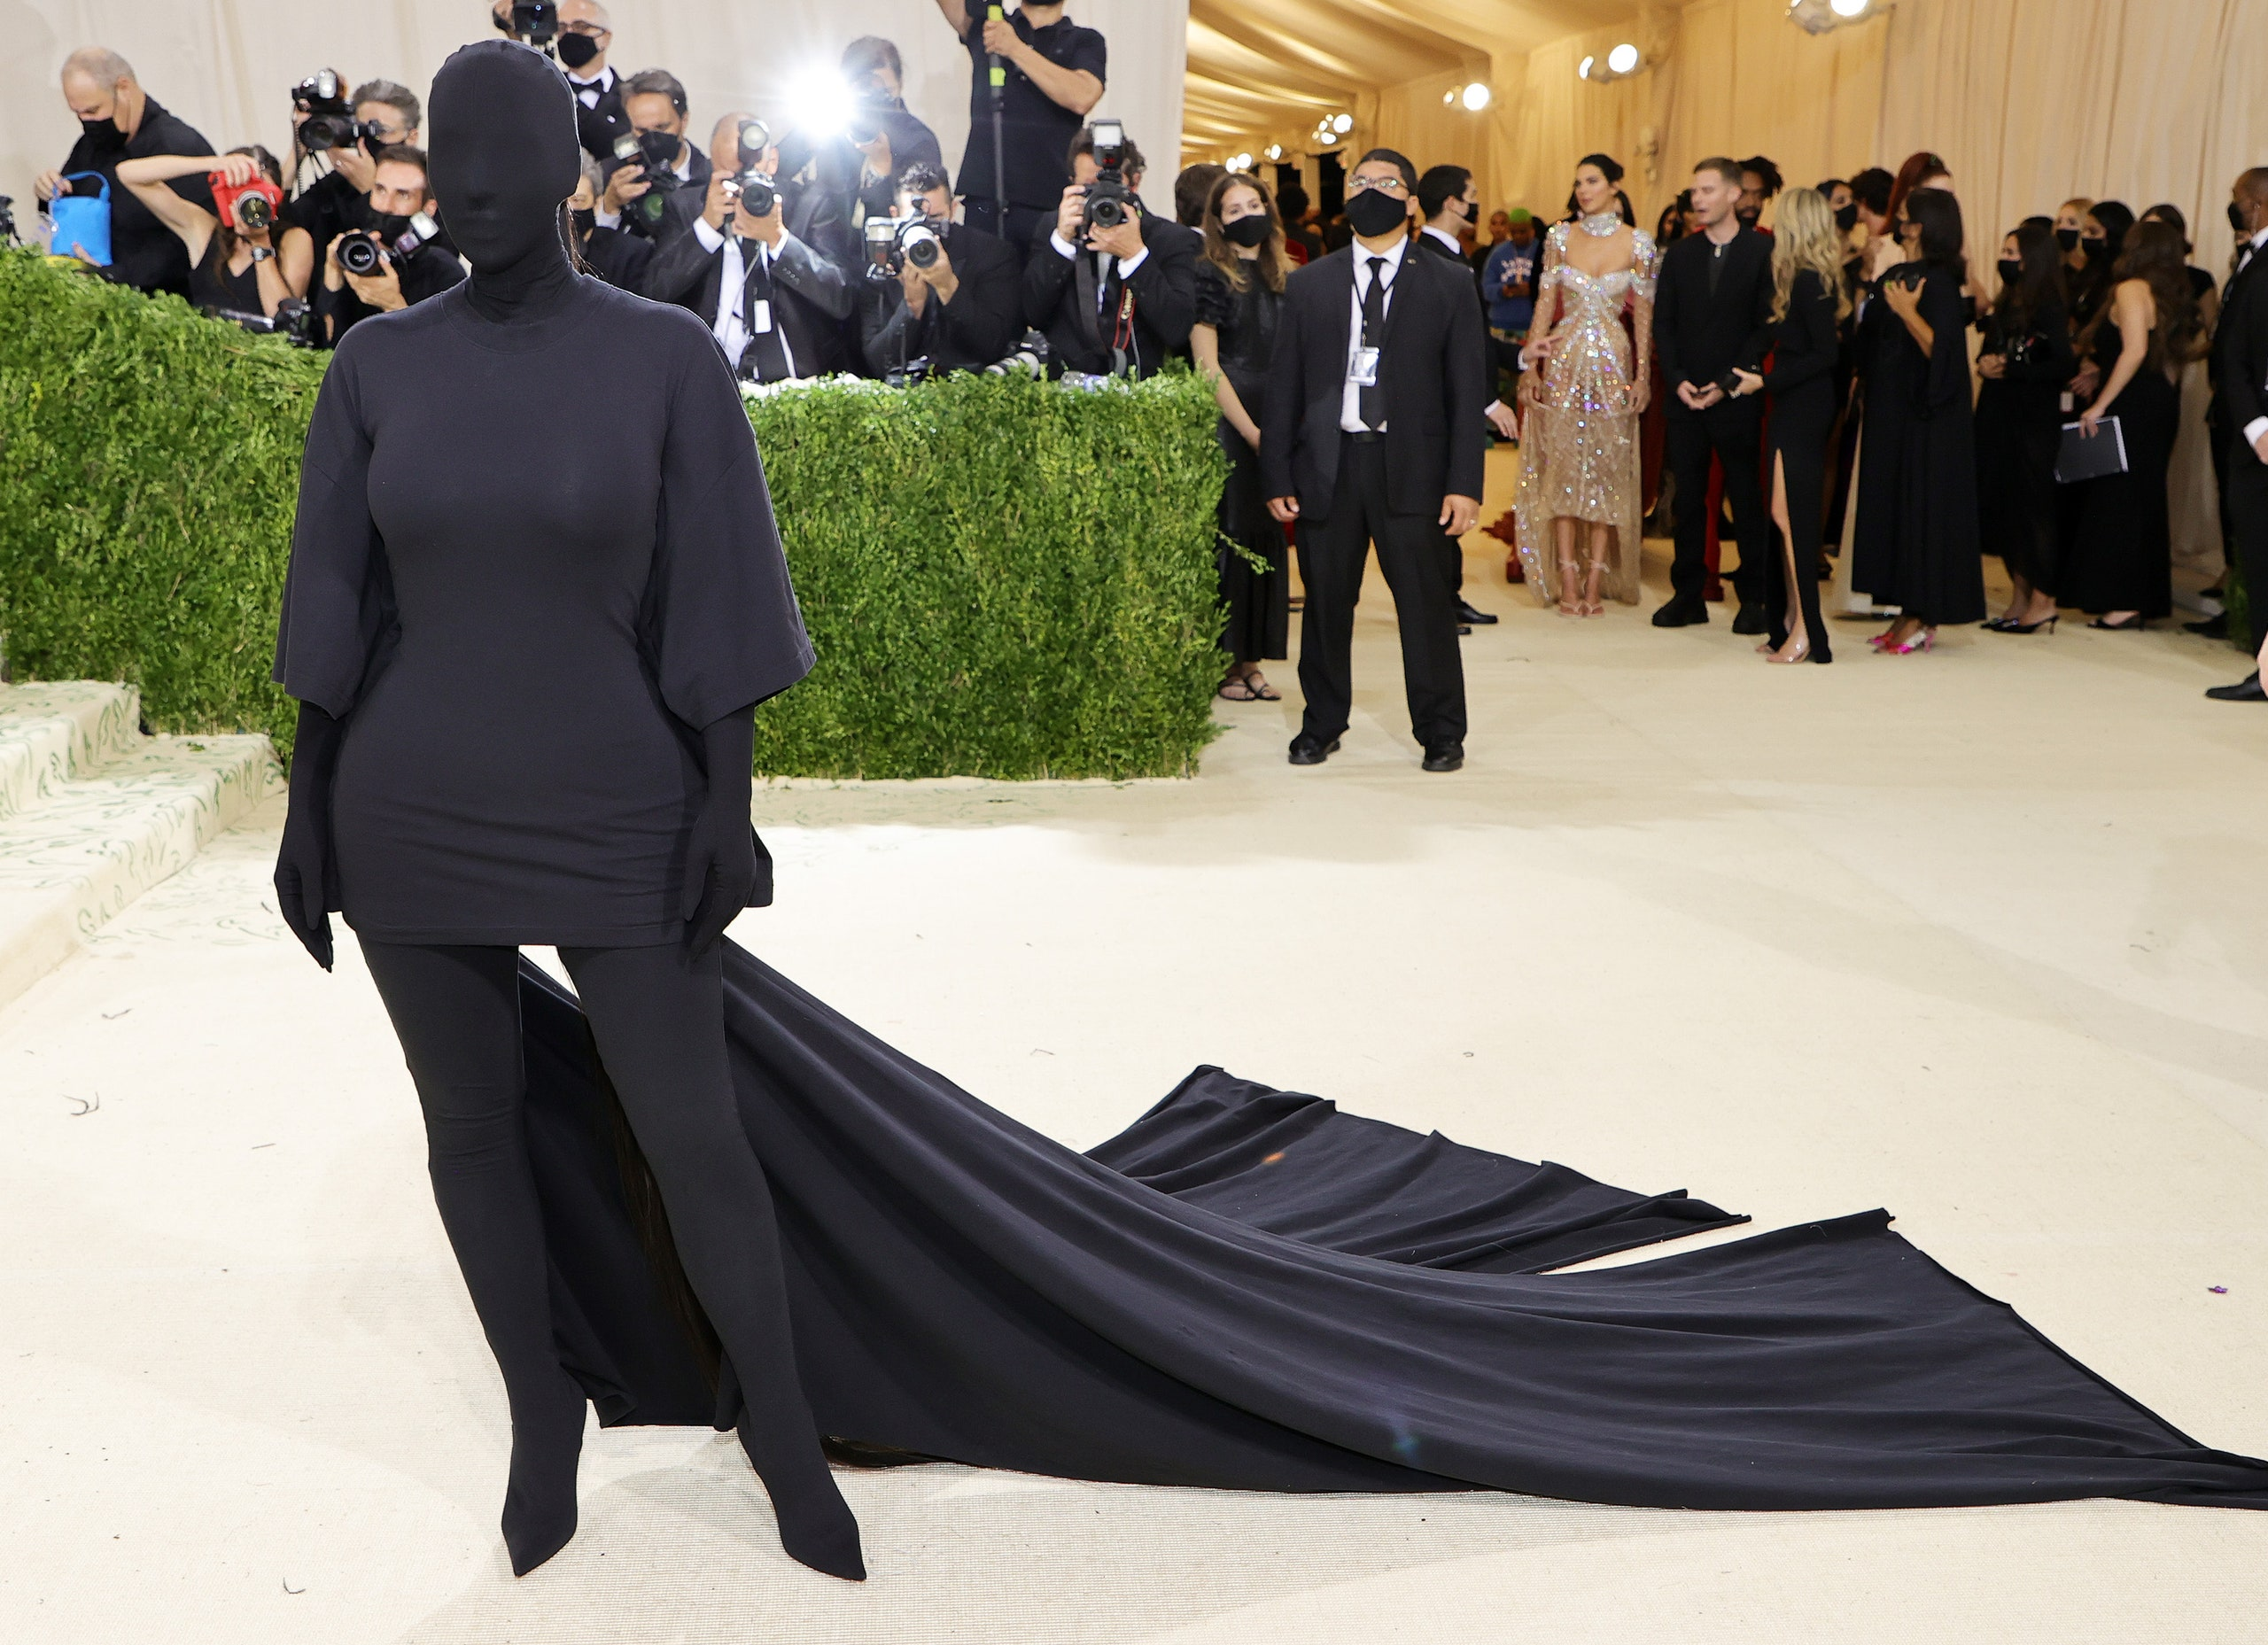 Kim Kardashian's Cover-Up Ditches Fashion to Make An Identity Statement